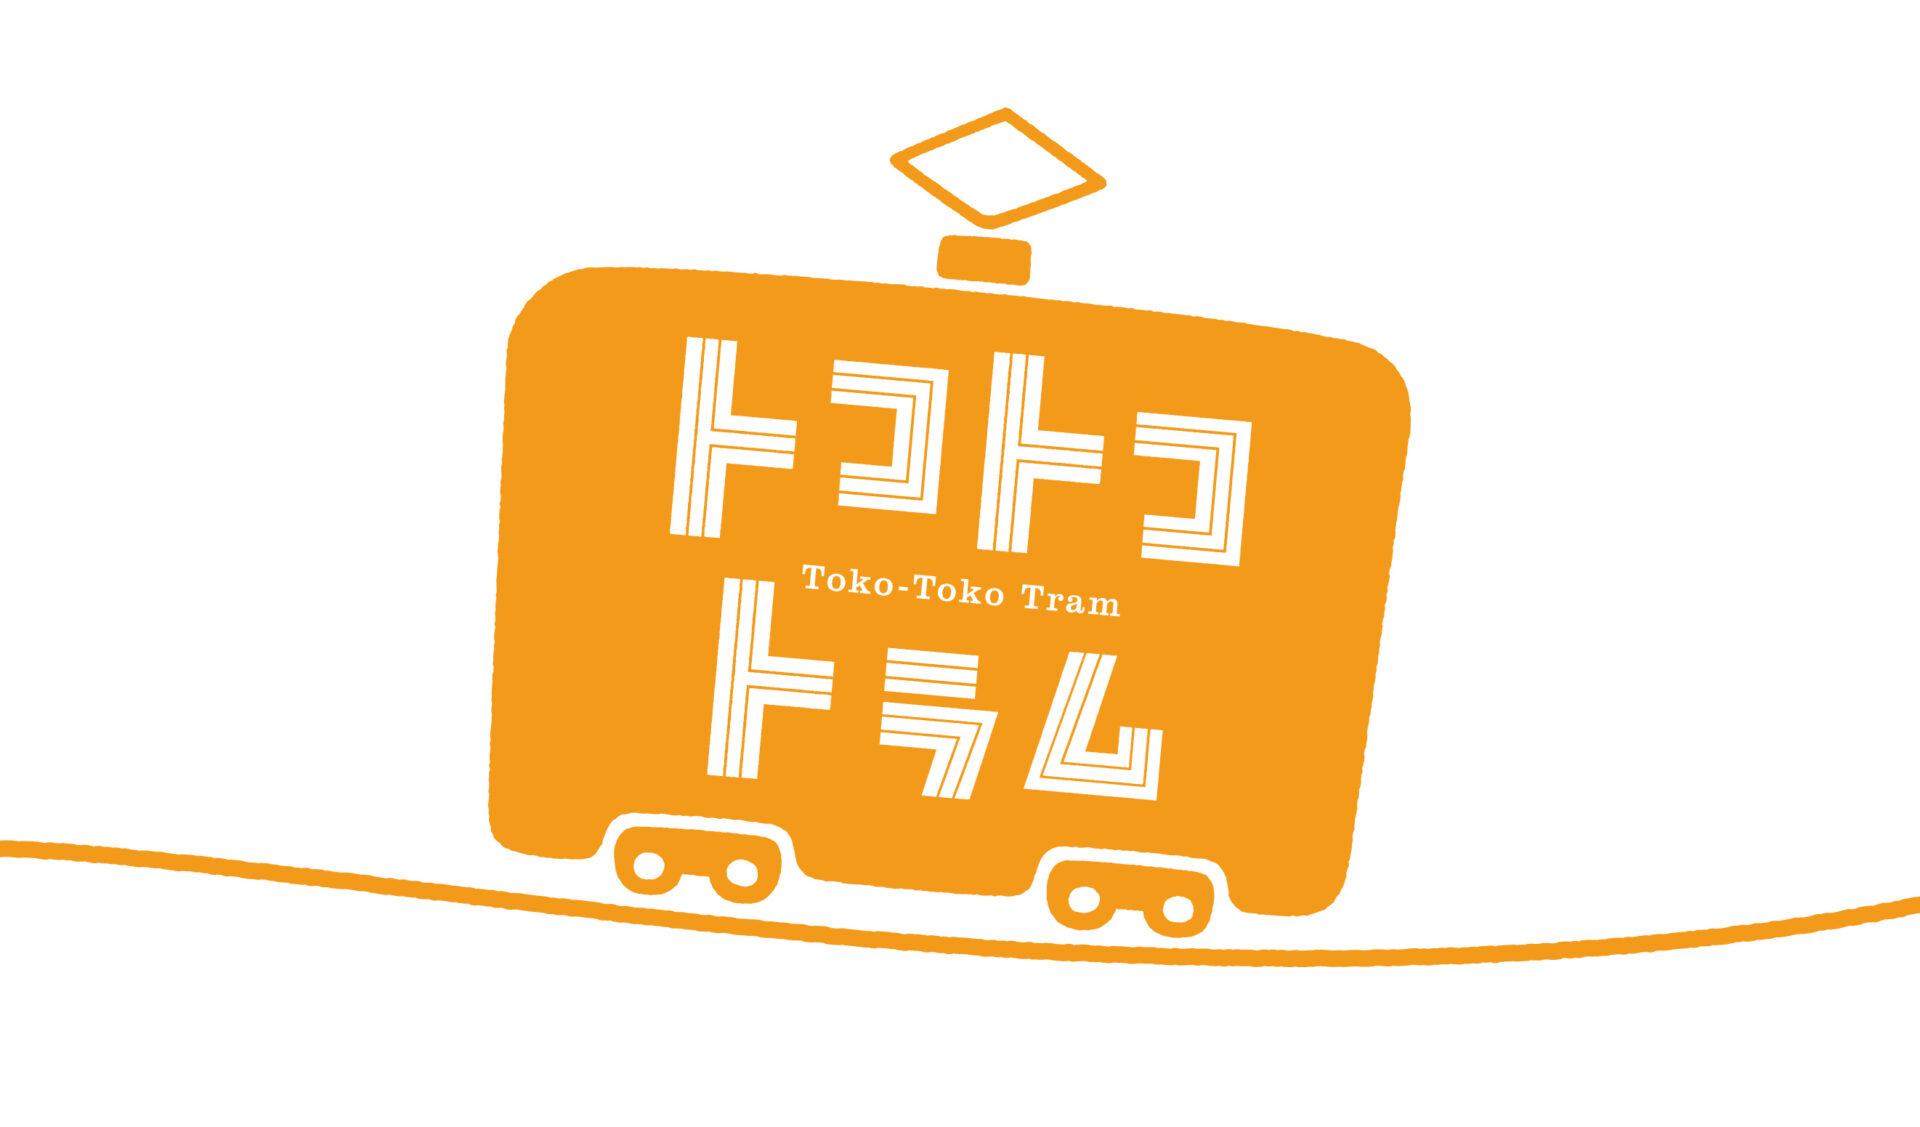 tram_logo_02